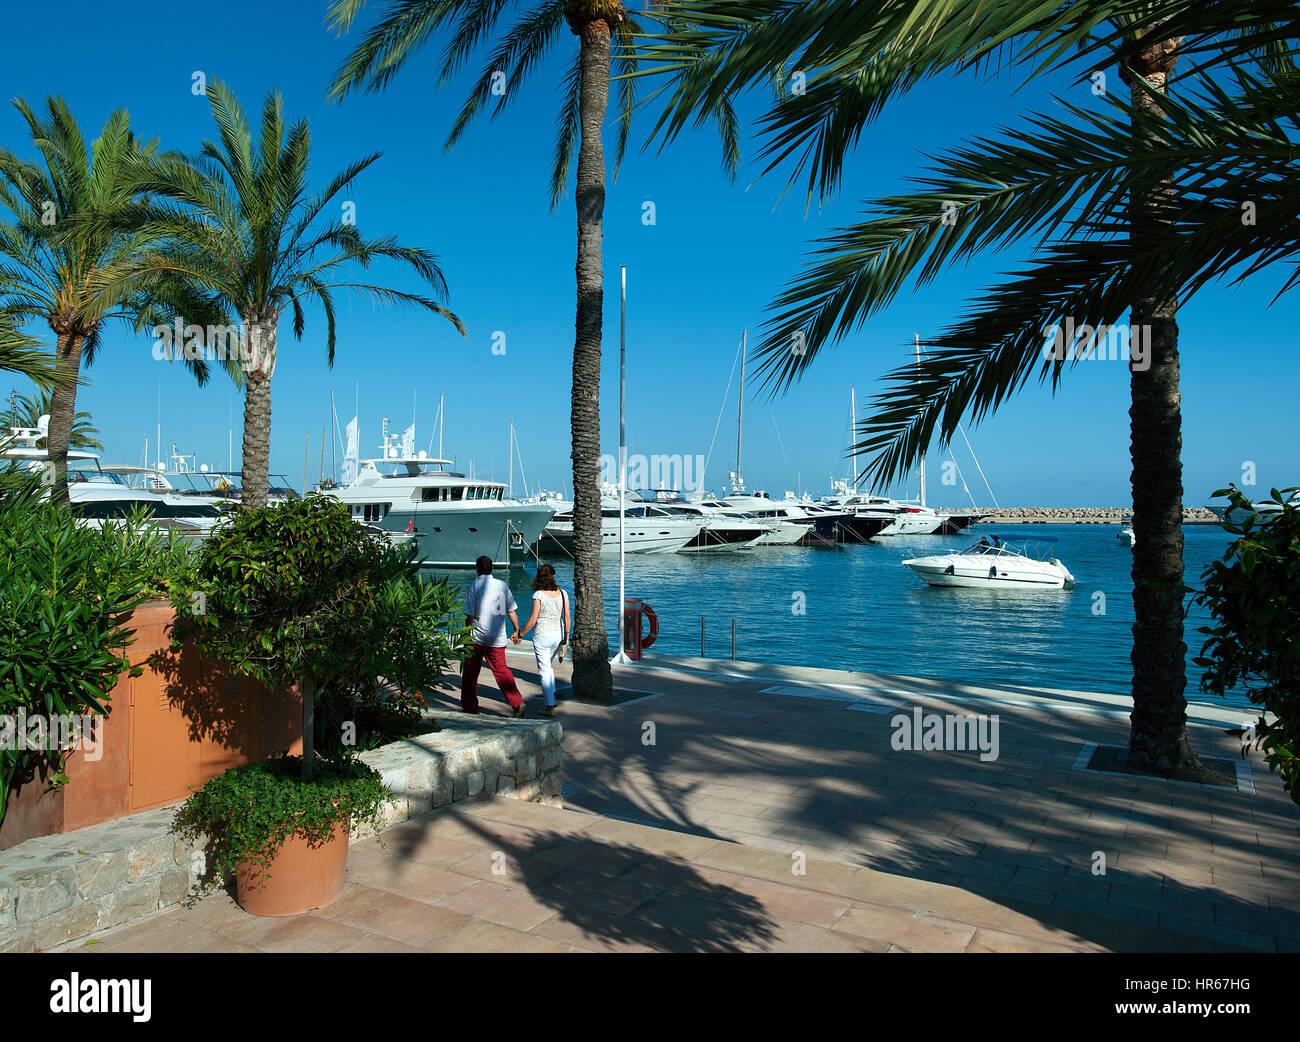 Portals Nous Marina, Mallorca, Balearics, Spain - Stock Image